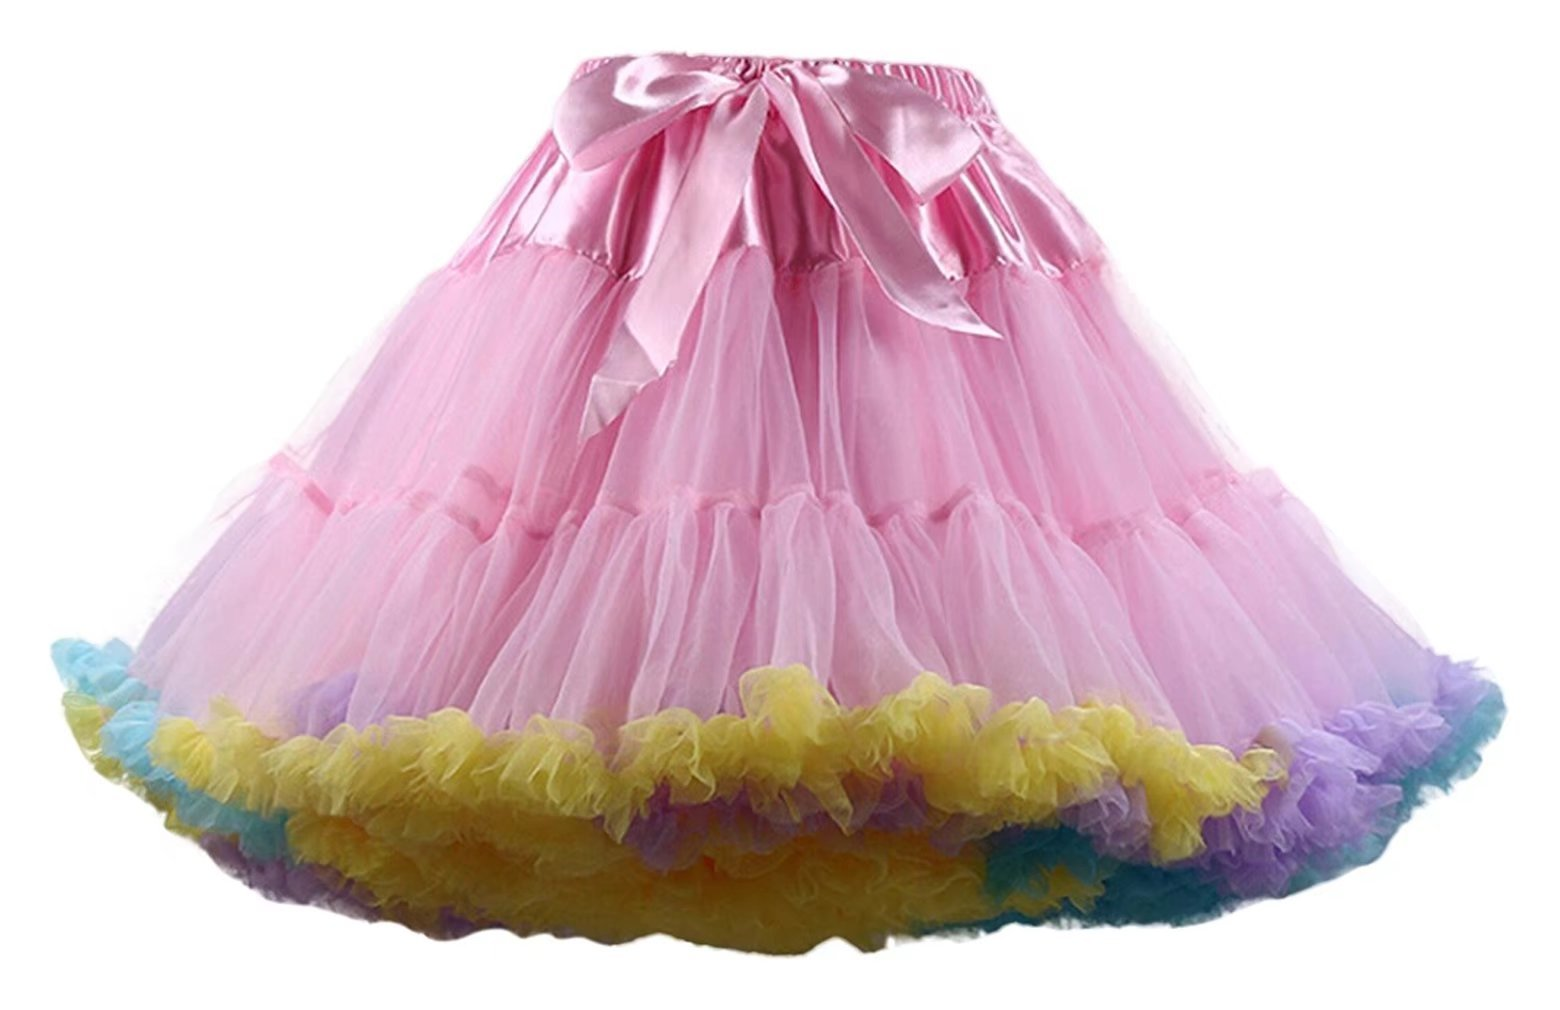 SZQINLI New Women's Short Petticoats Elasticity Tulle Skirts CQ005